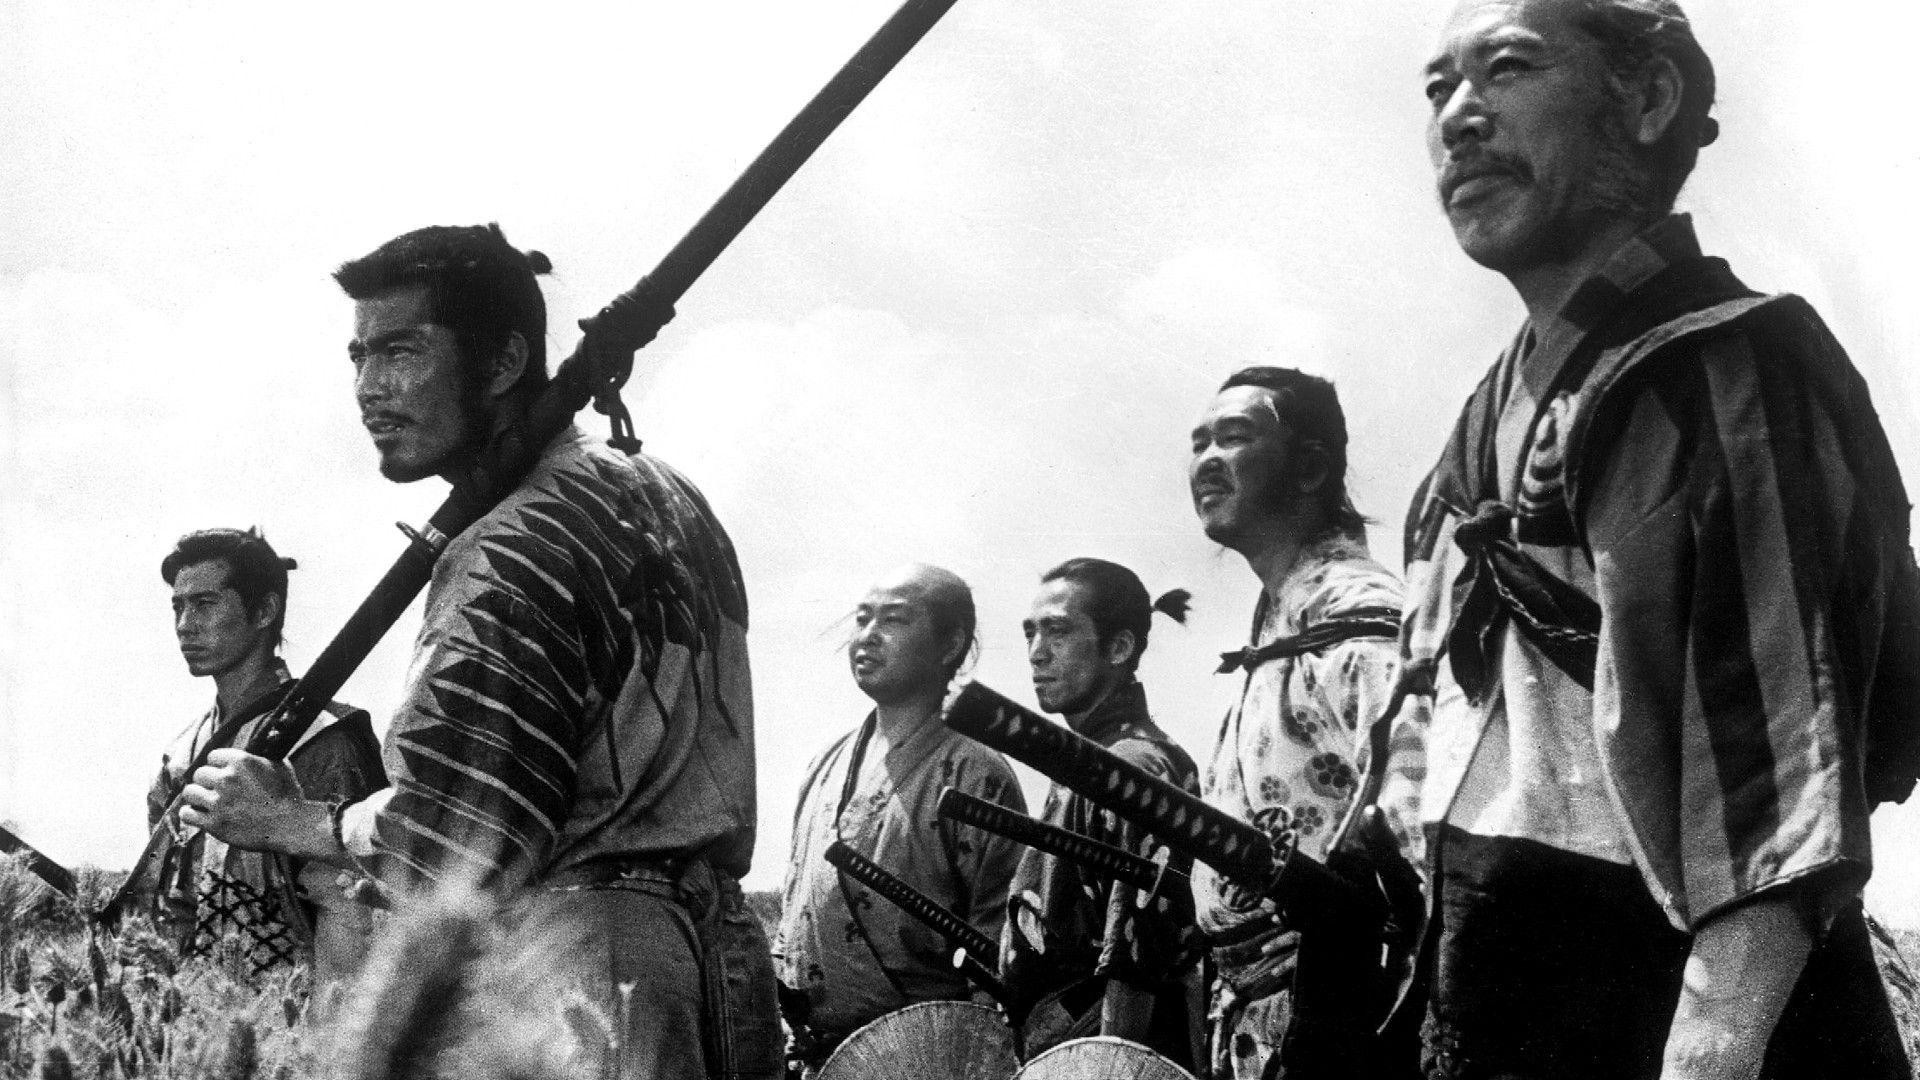 Seven Samurai HD Wallpaper | Movies Wallpapers